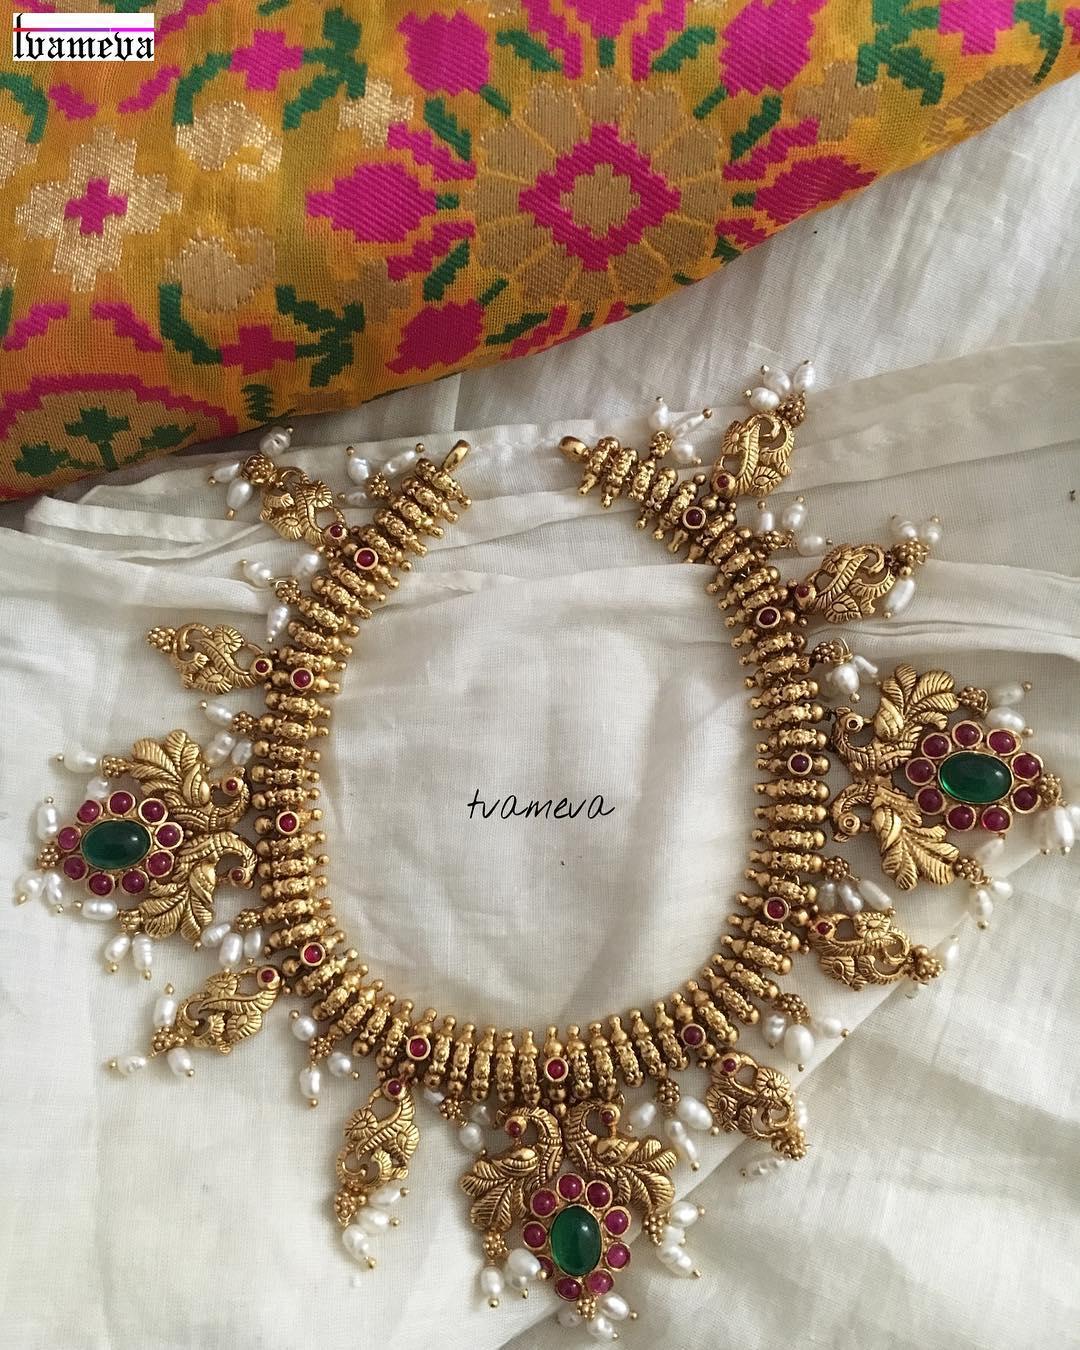 Silver Gold polish Guttapoosalu necklace From Tvameva